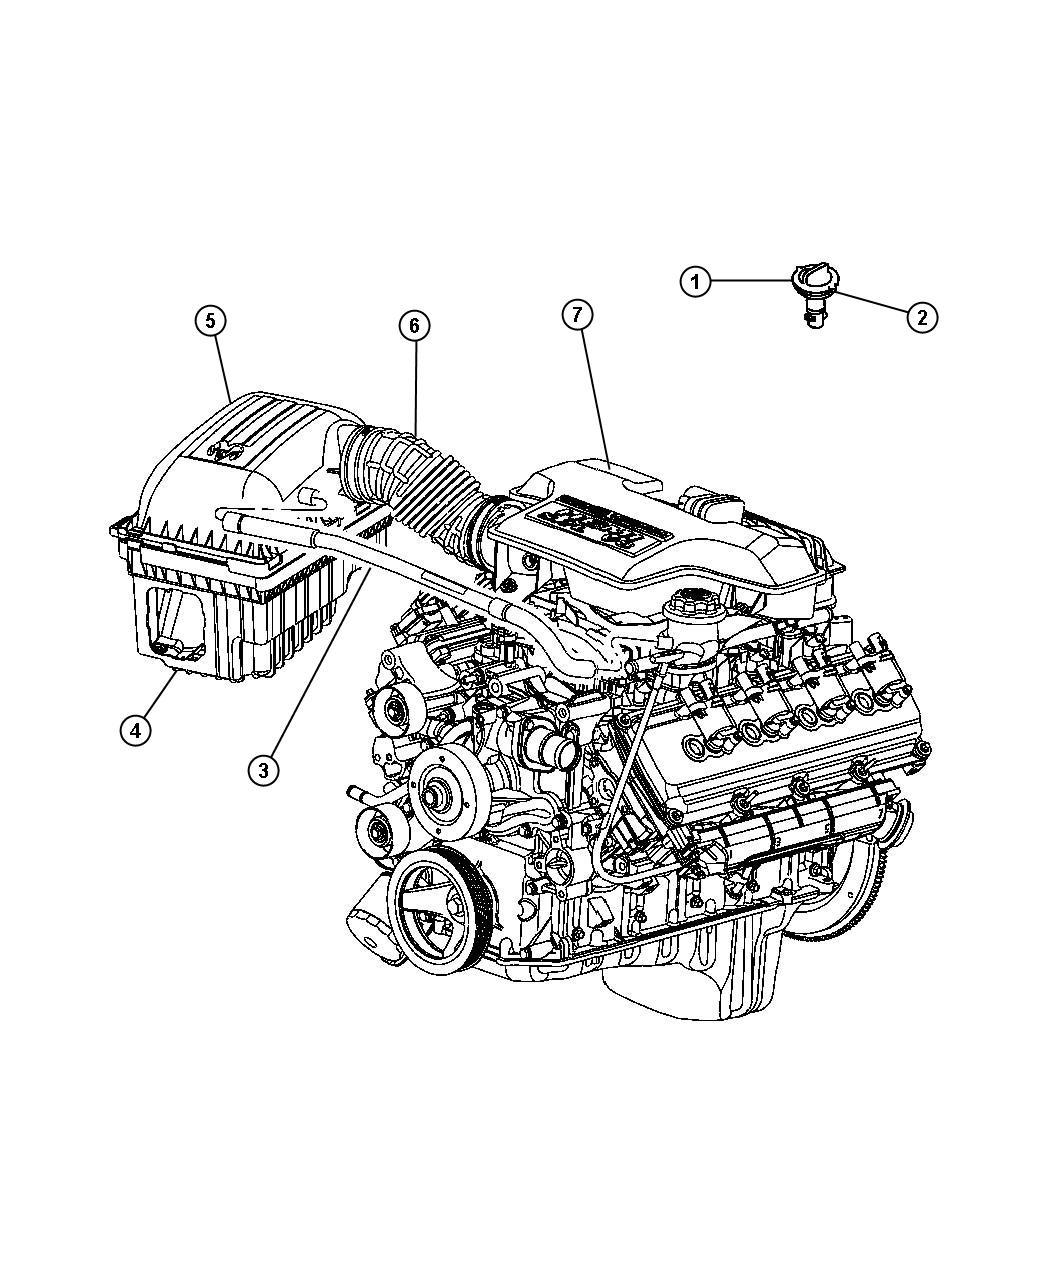 Dodge Magnum R T 5 7l Hemi V8 Valve Crankcase Vent